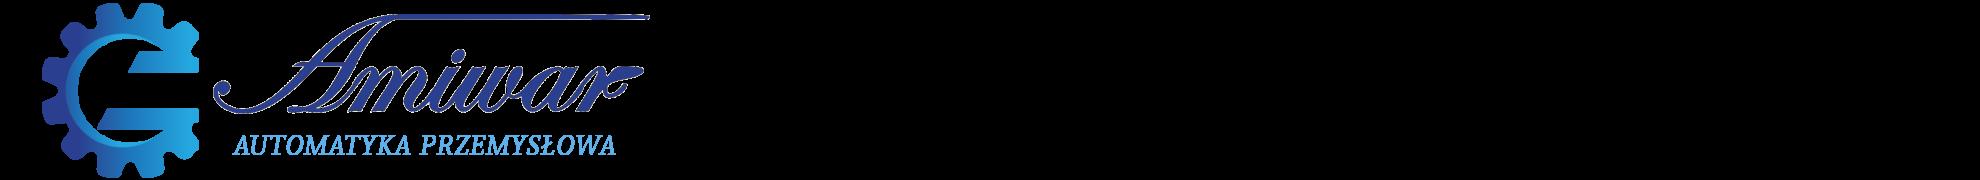 P.H.U. AMIWAR Logo